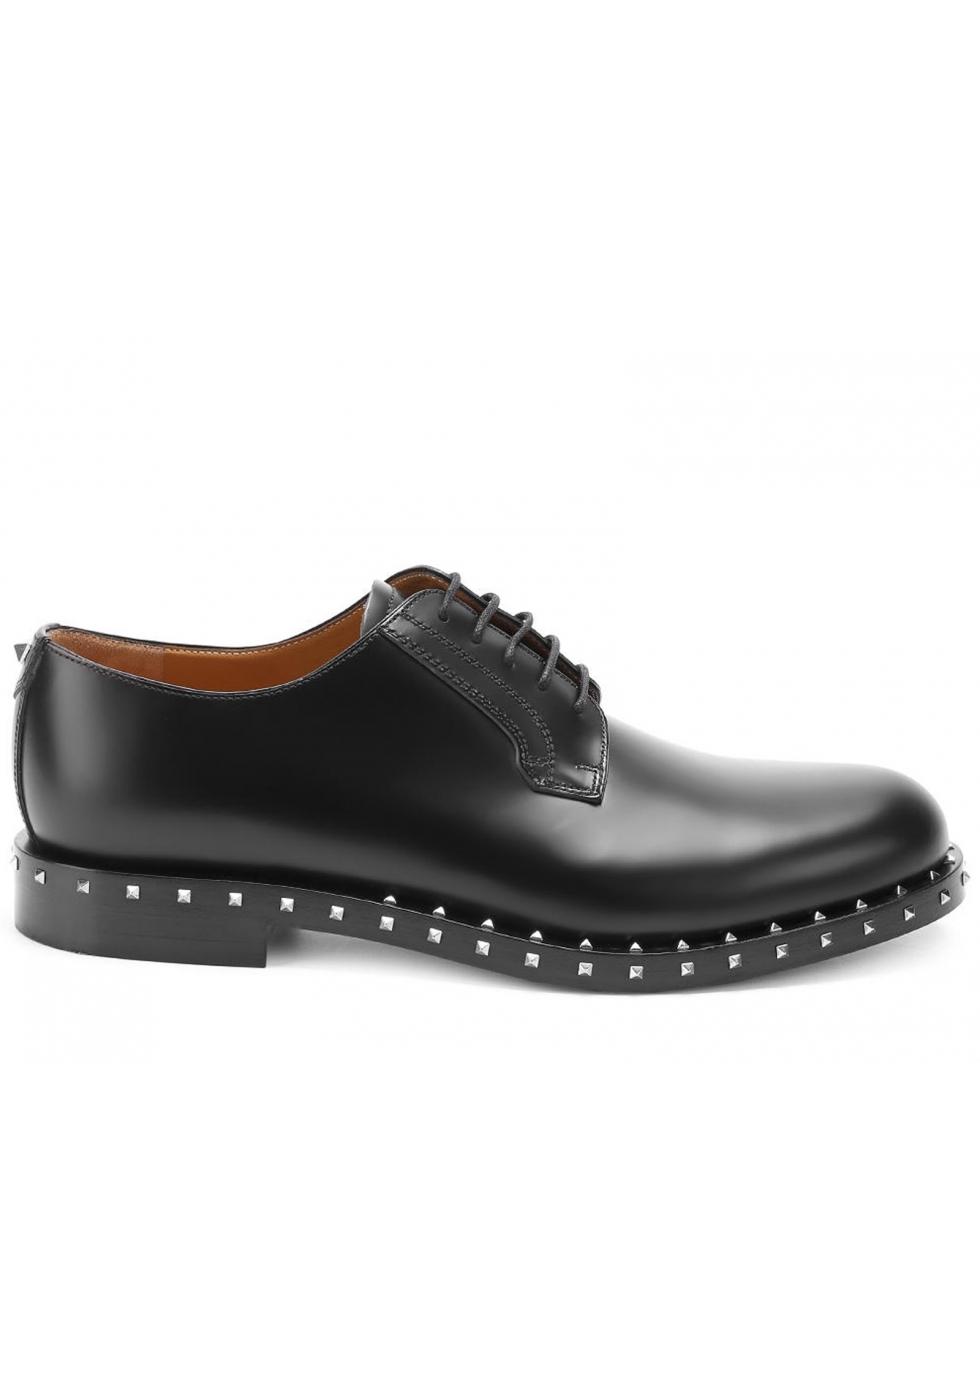 Armani Mens Shoes Usa